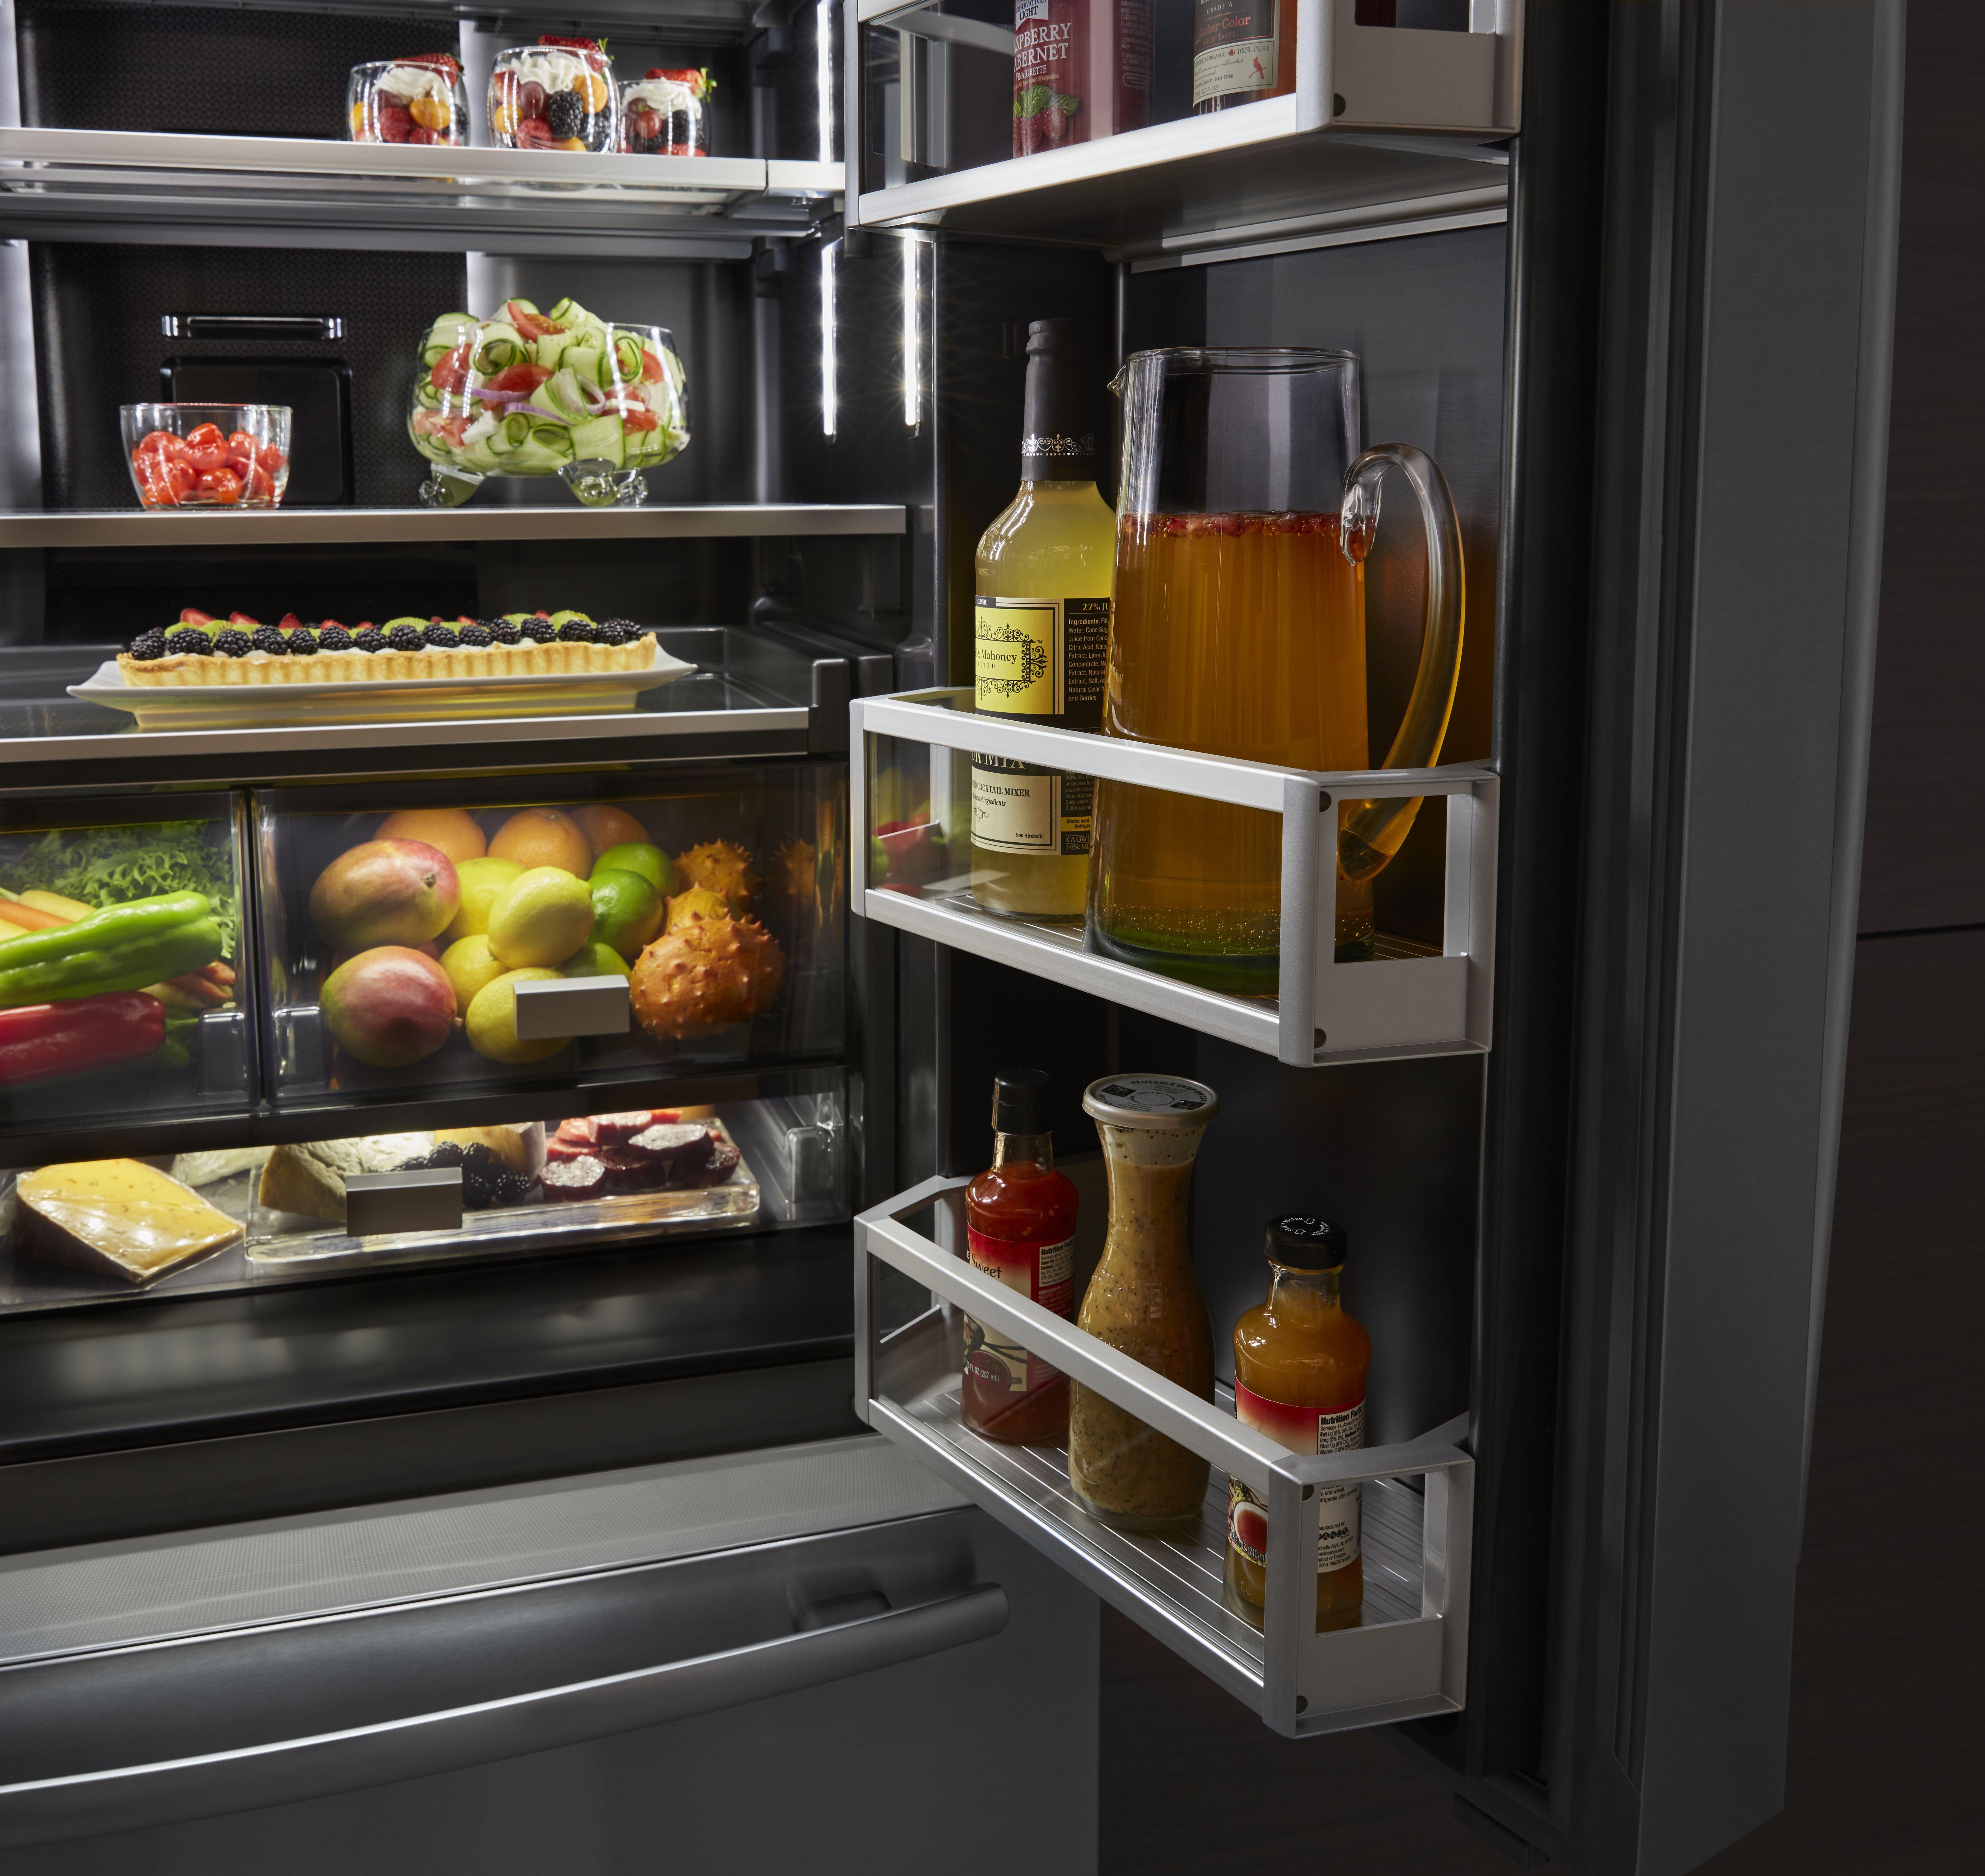 Jenn Air 24 Cu Ft Counter Depth French Door Refrigerator